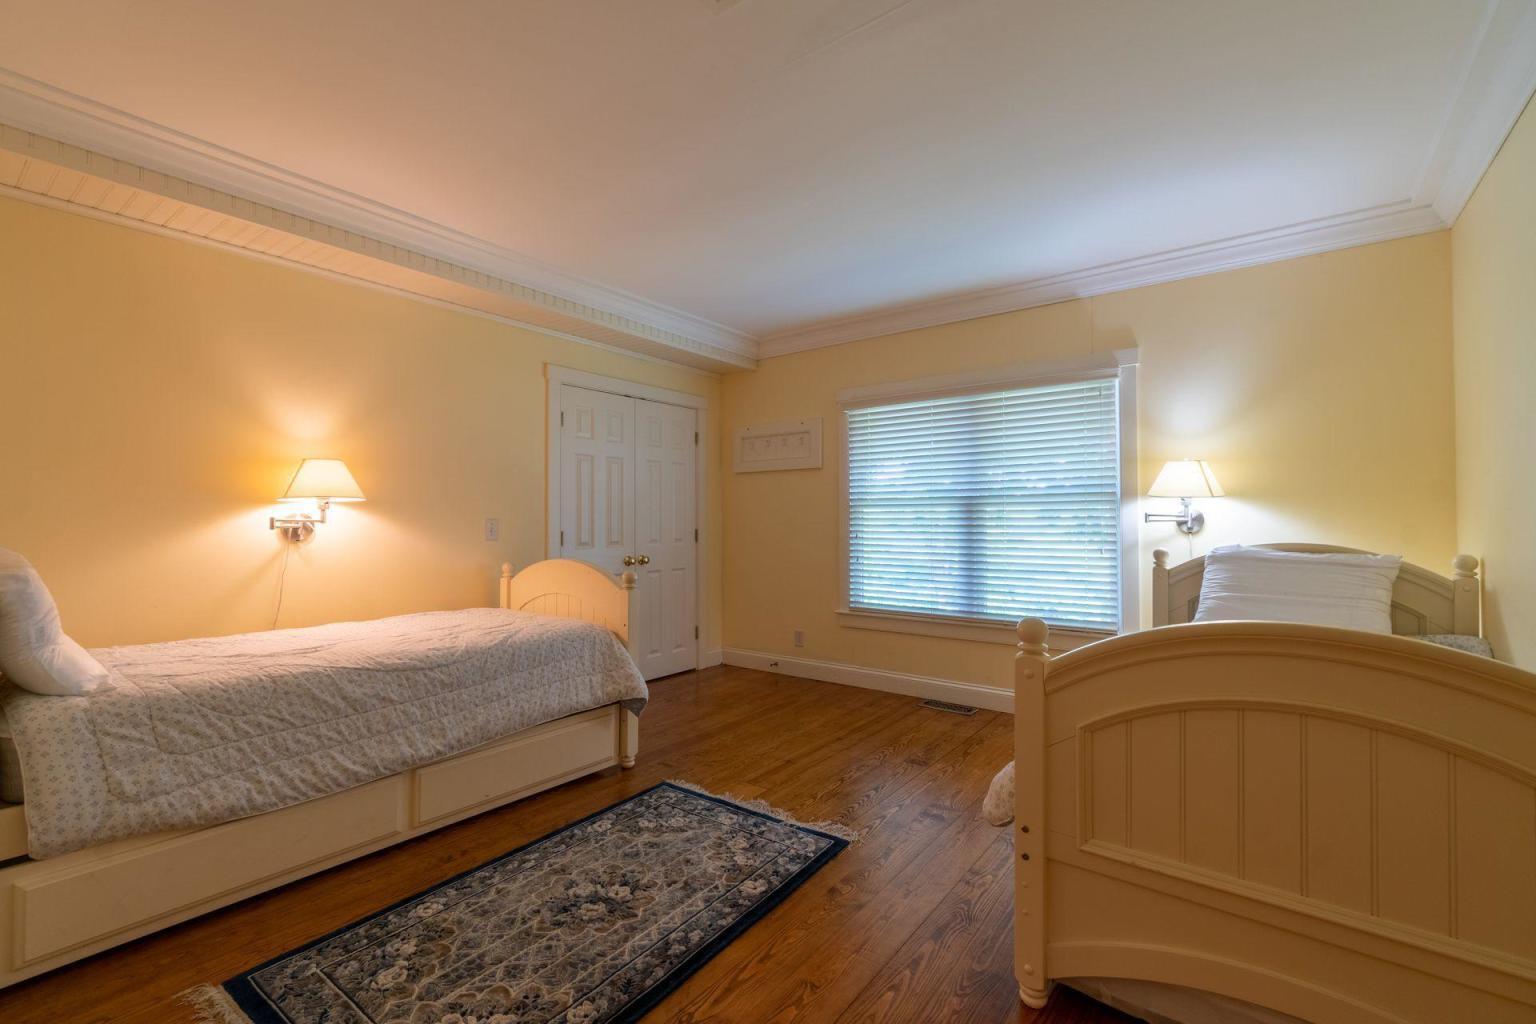 161 Kelley Lane, Chatham, Massachusetts, 02633, 5 Bedrooms Bedrooms, ,4 BathroomsBathrooms,Residential,For Sale,161 Kelley Lane,22002348